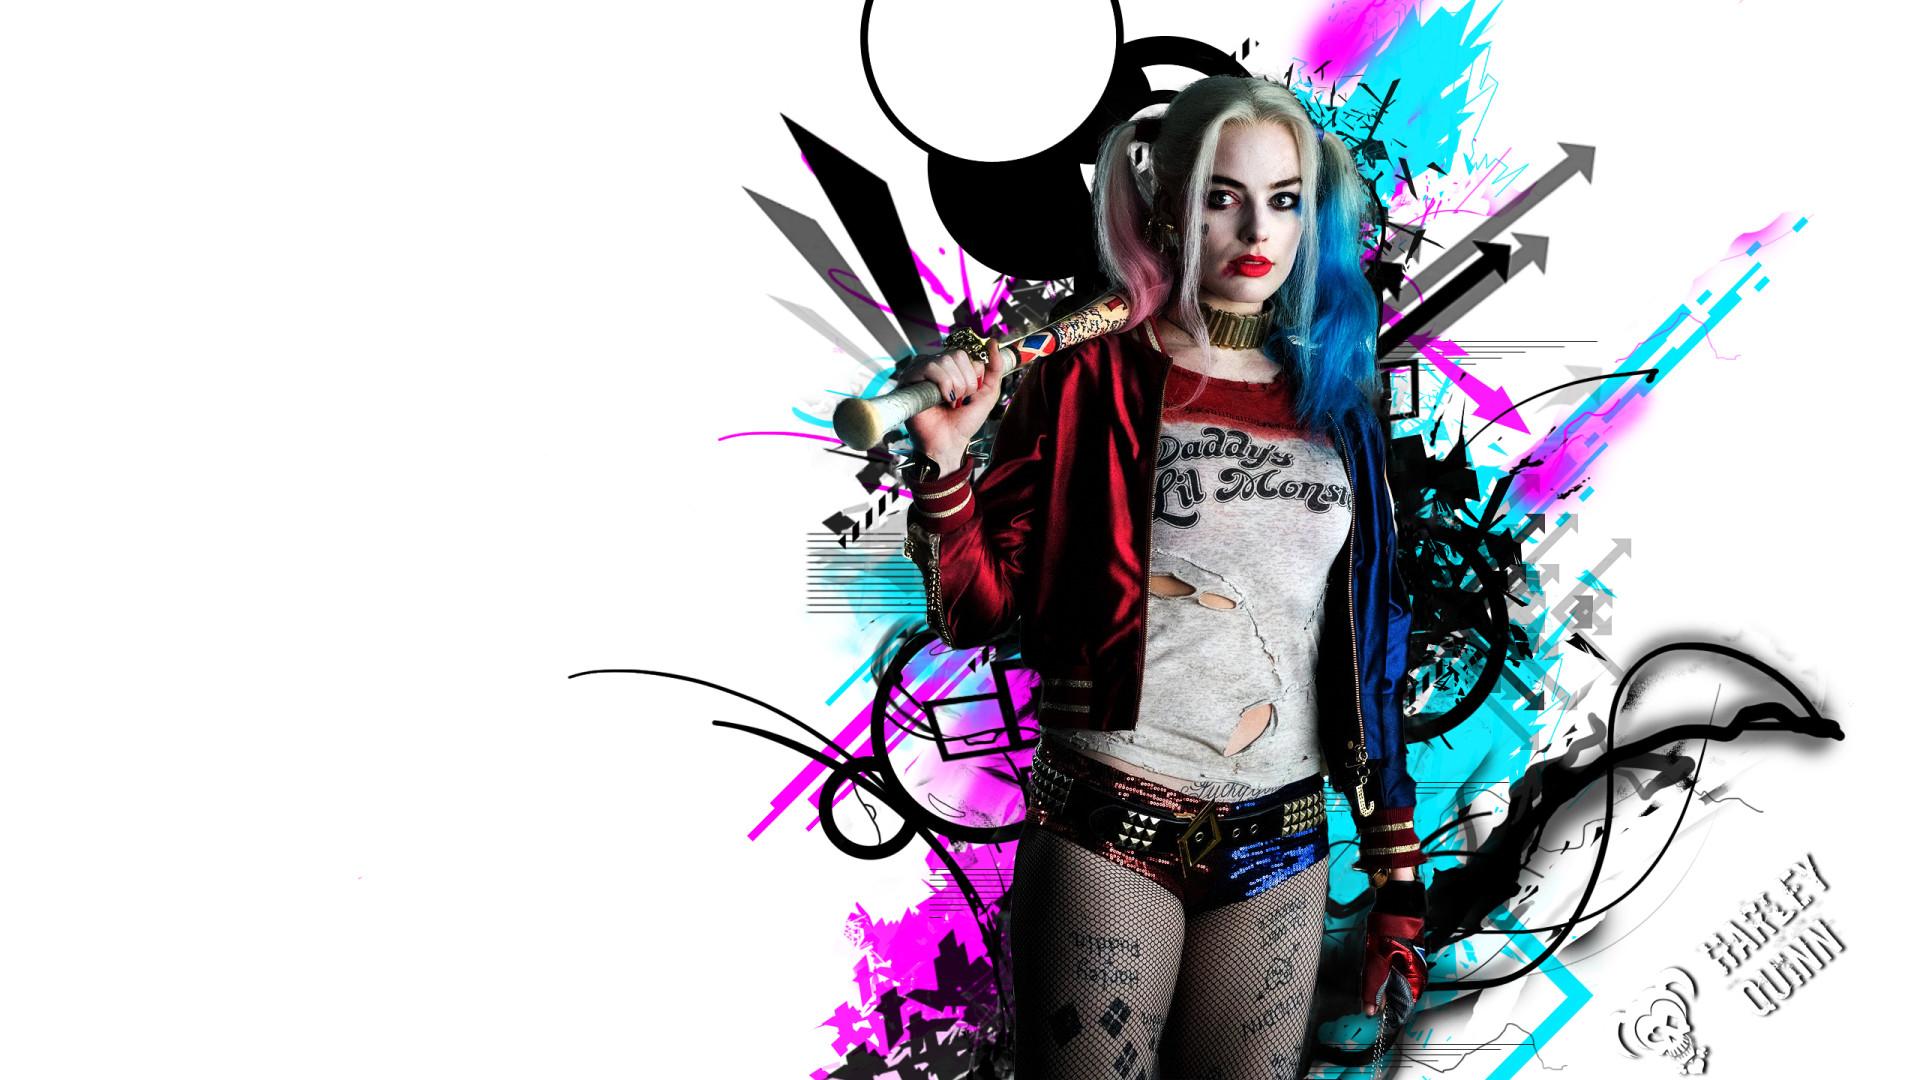 Harley Quinn Laptop Wallpapers On Wallpaperdog